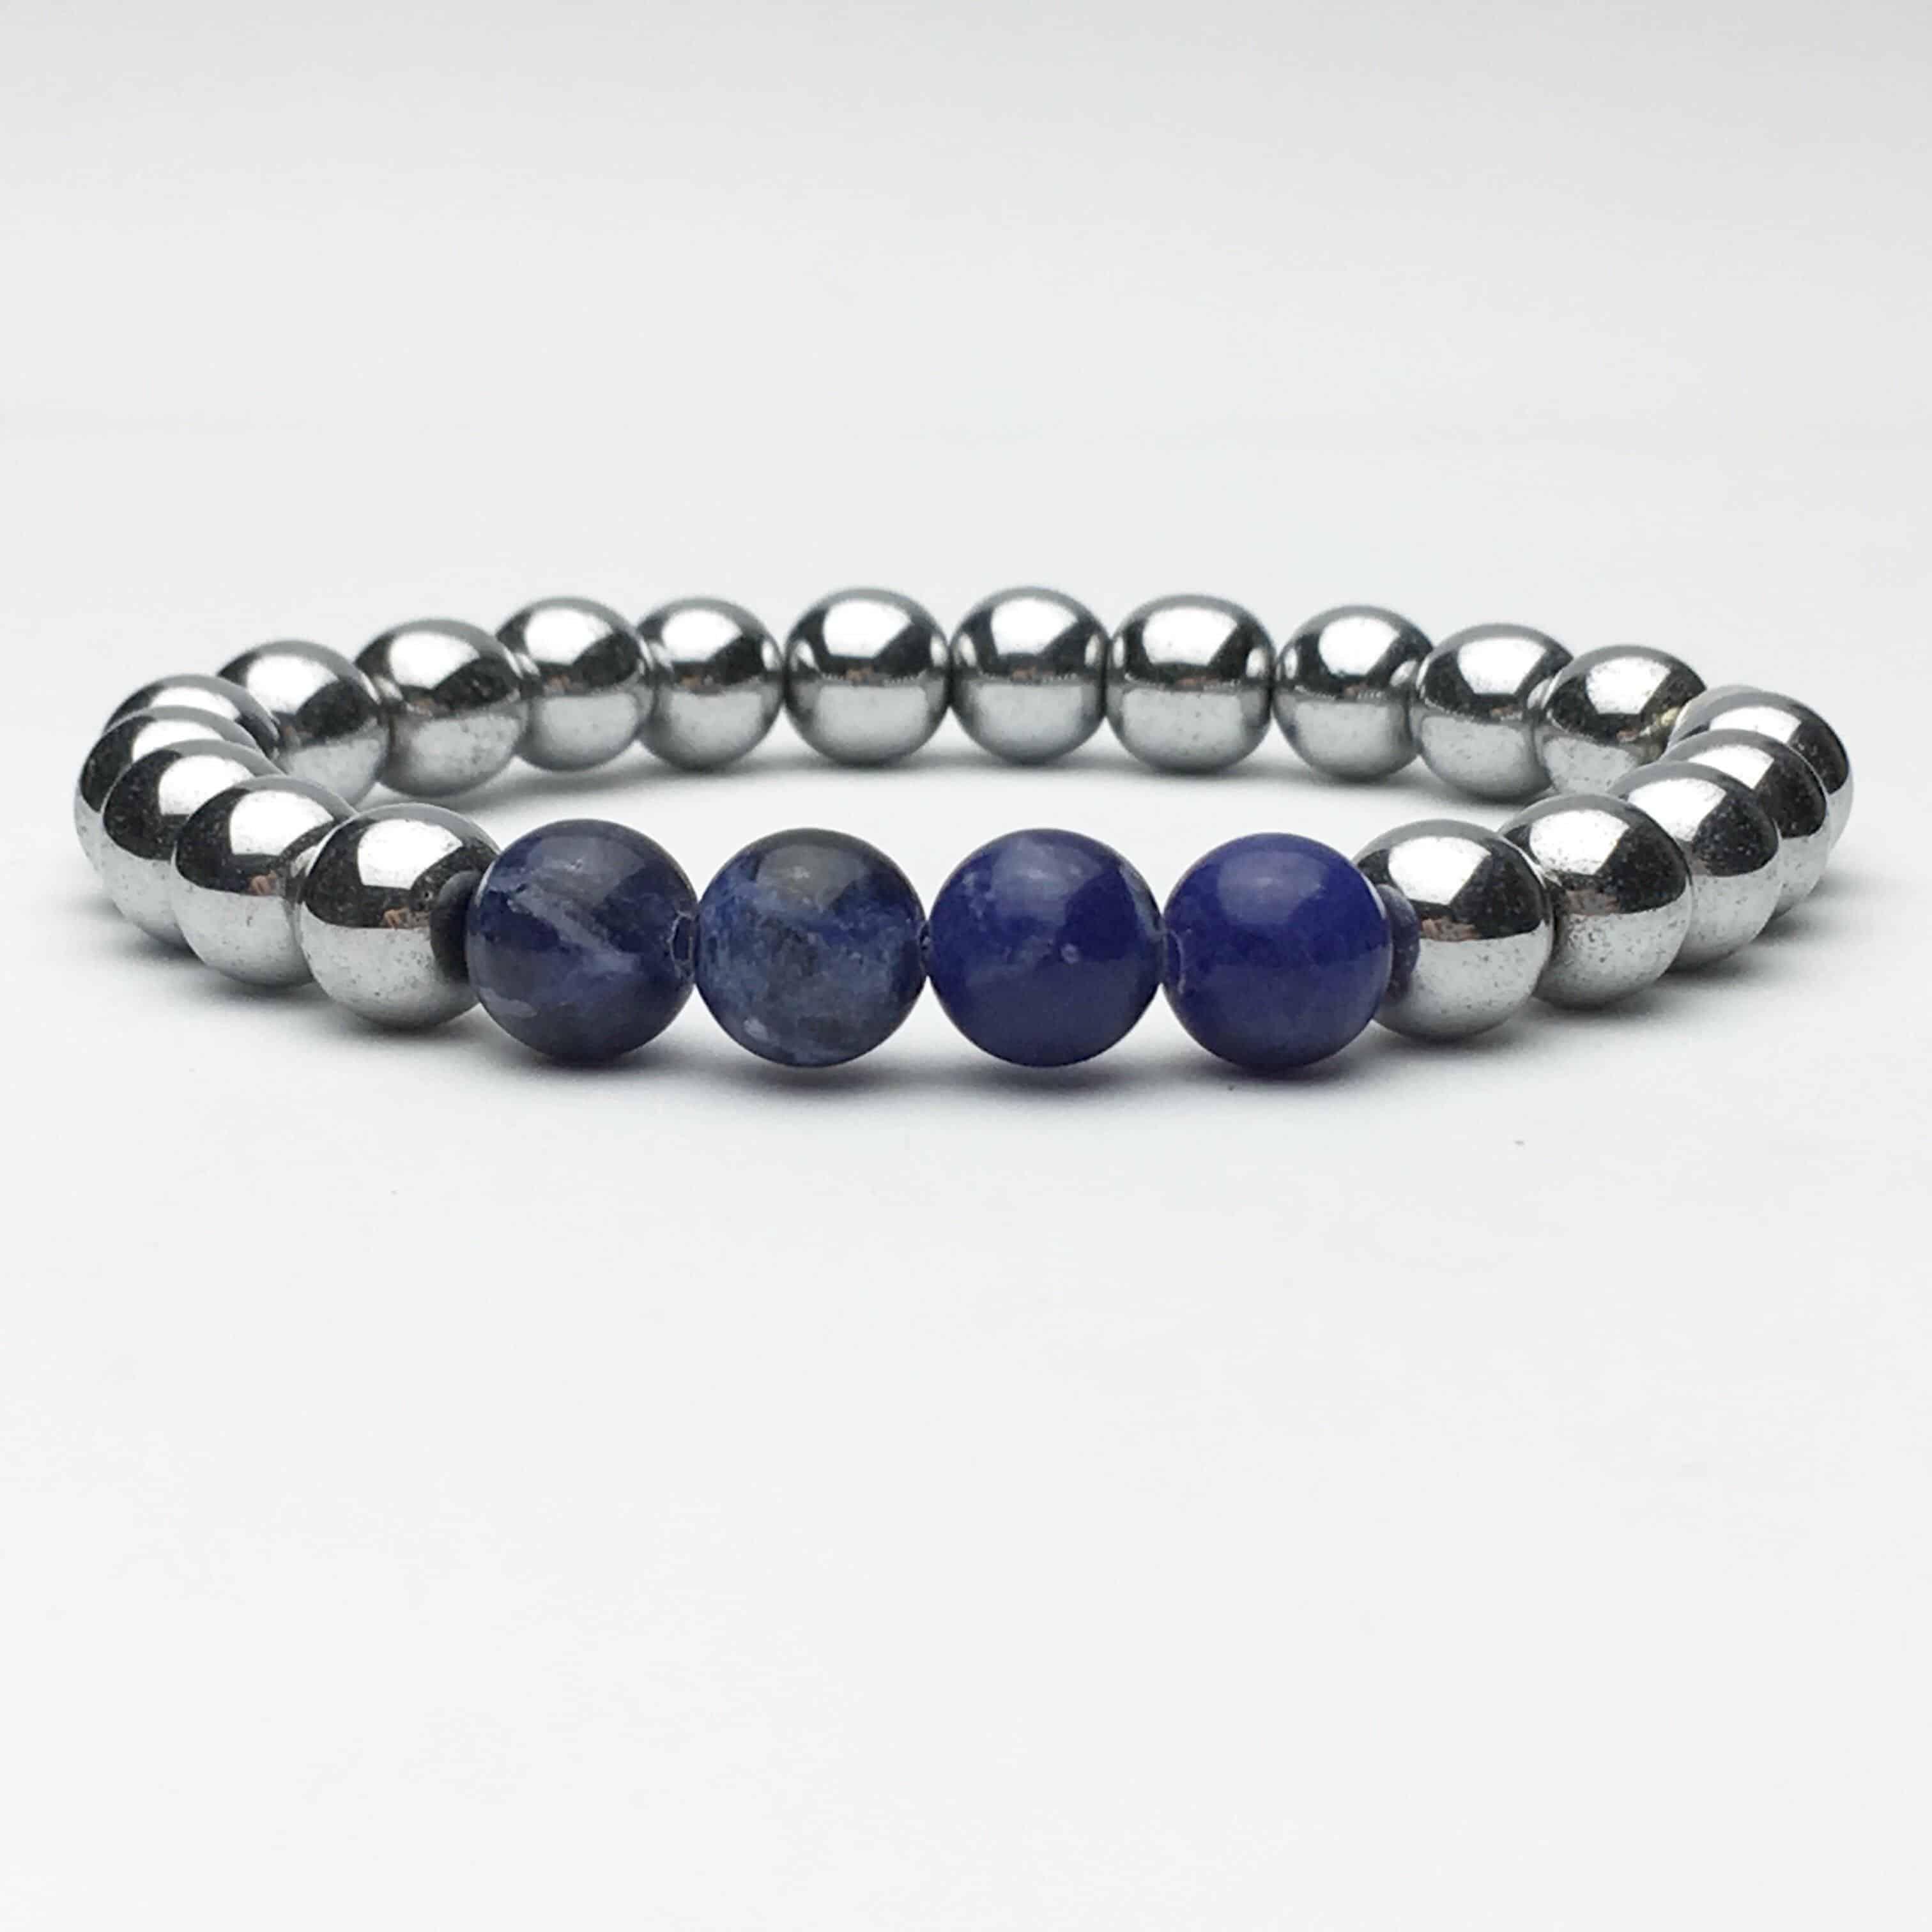 Silver Hematite and Sodalite Bracelet